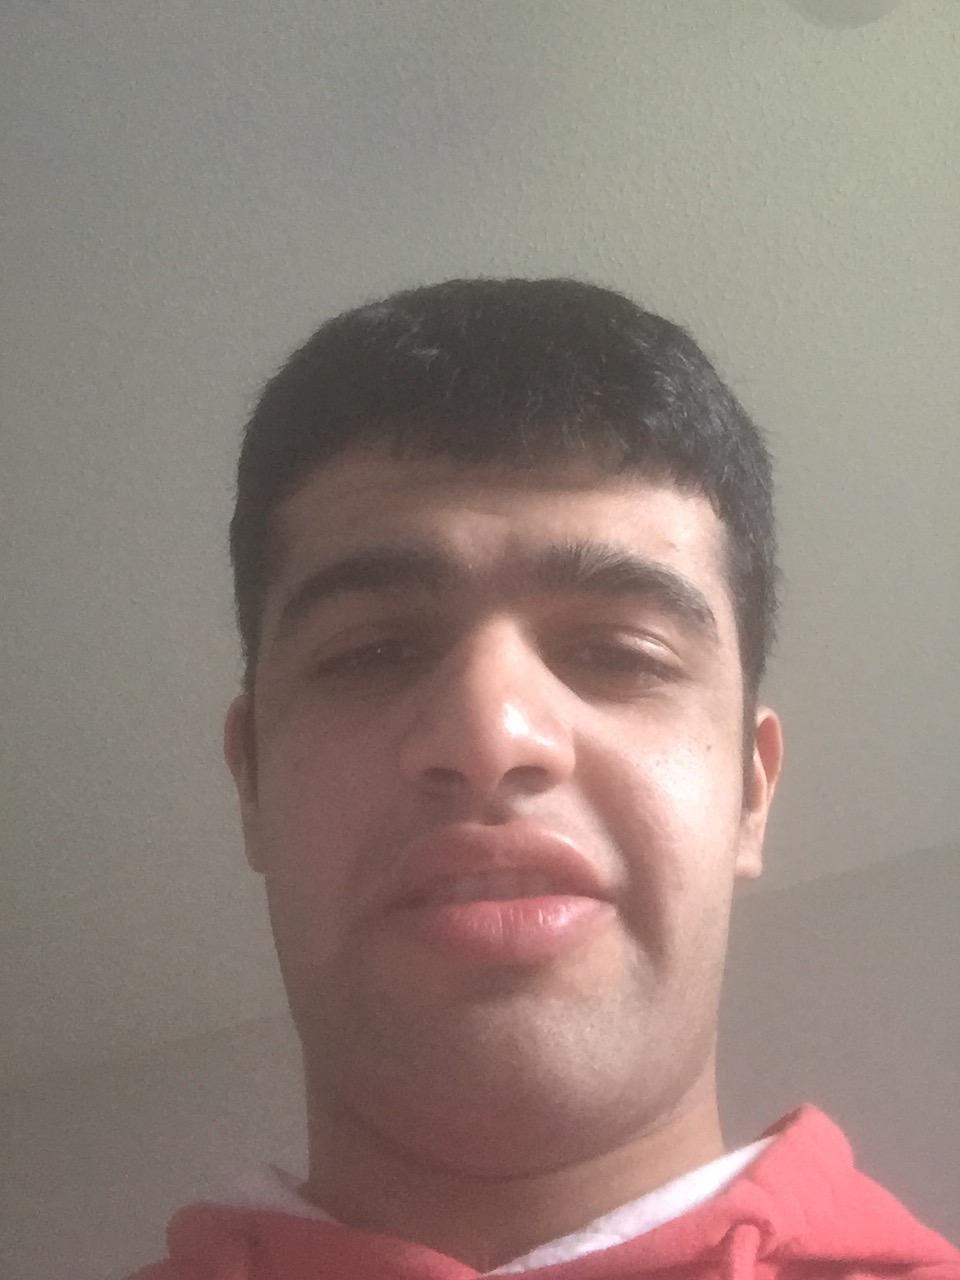 @zaina500000000000's snapchat picture for zaina5000000002019